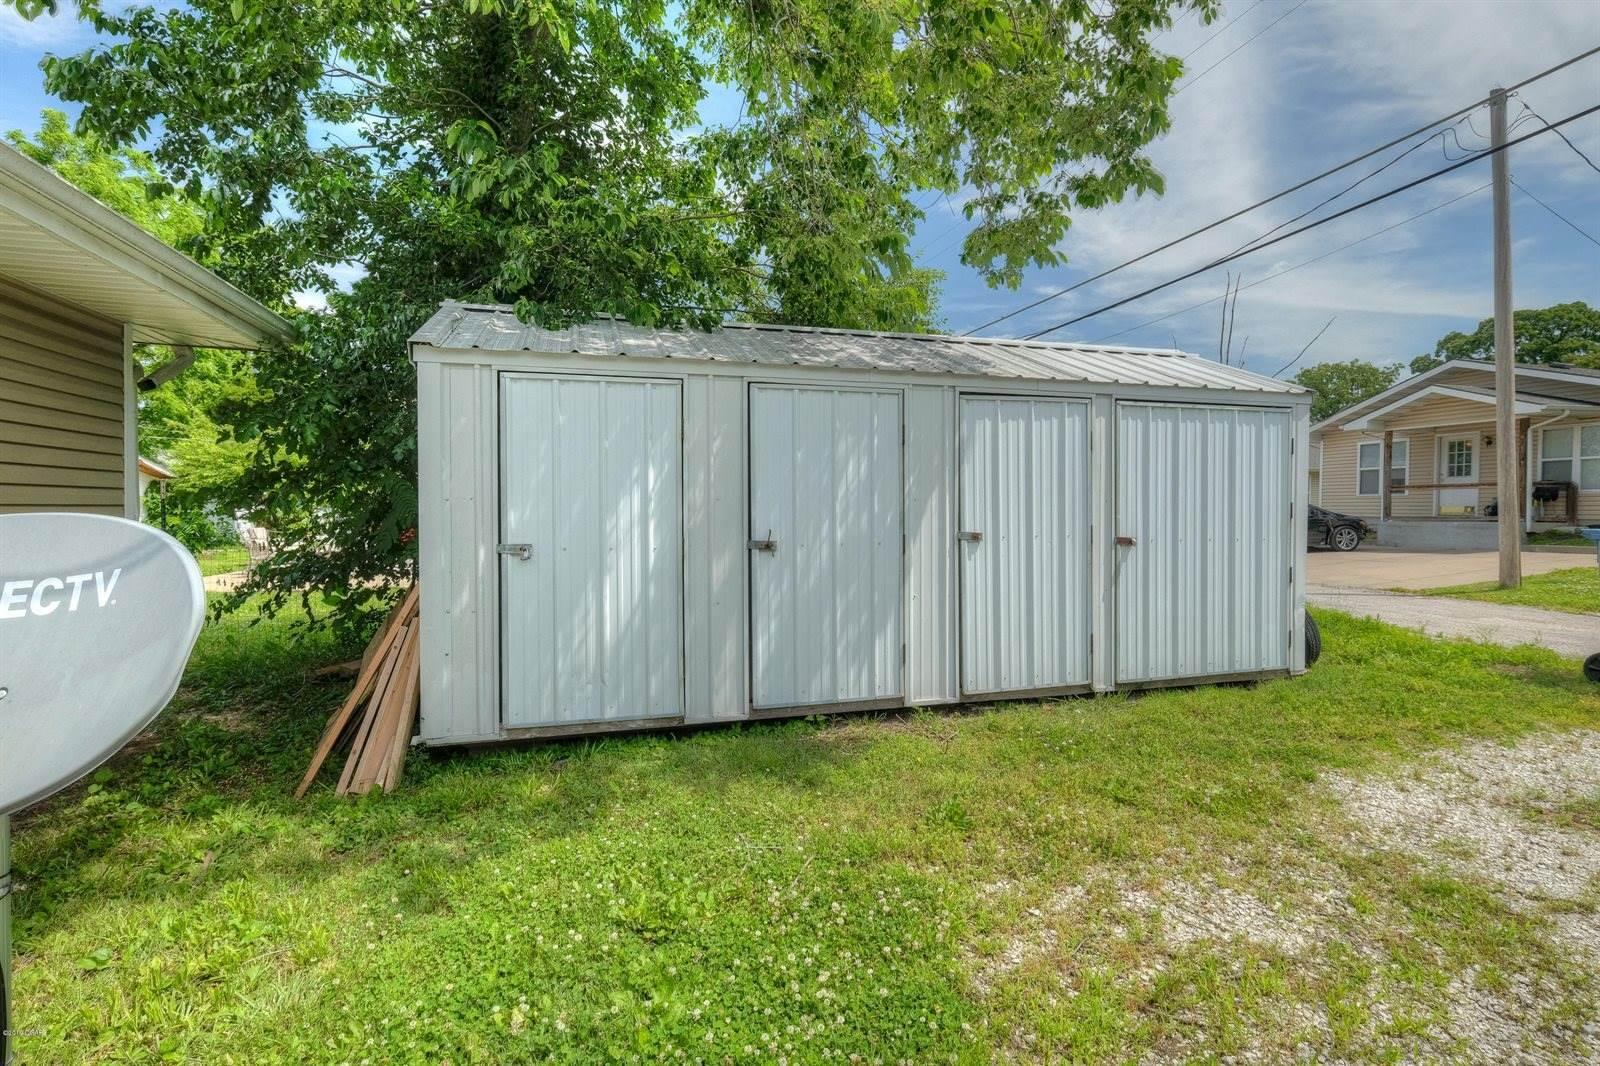 129-131 South St Louis Avenue, Joplin, MO 64801